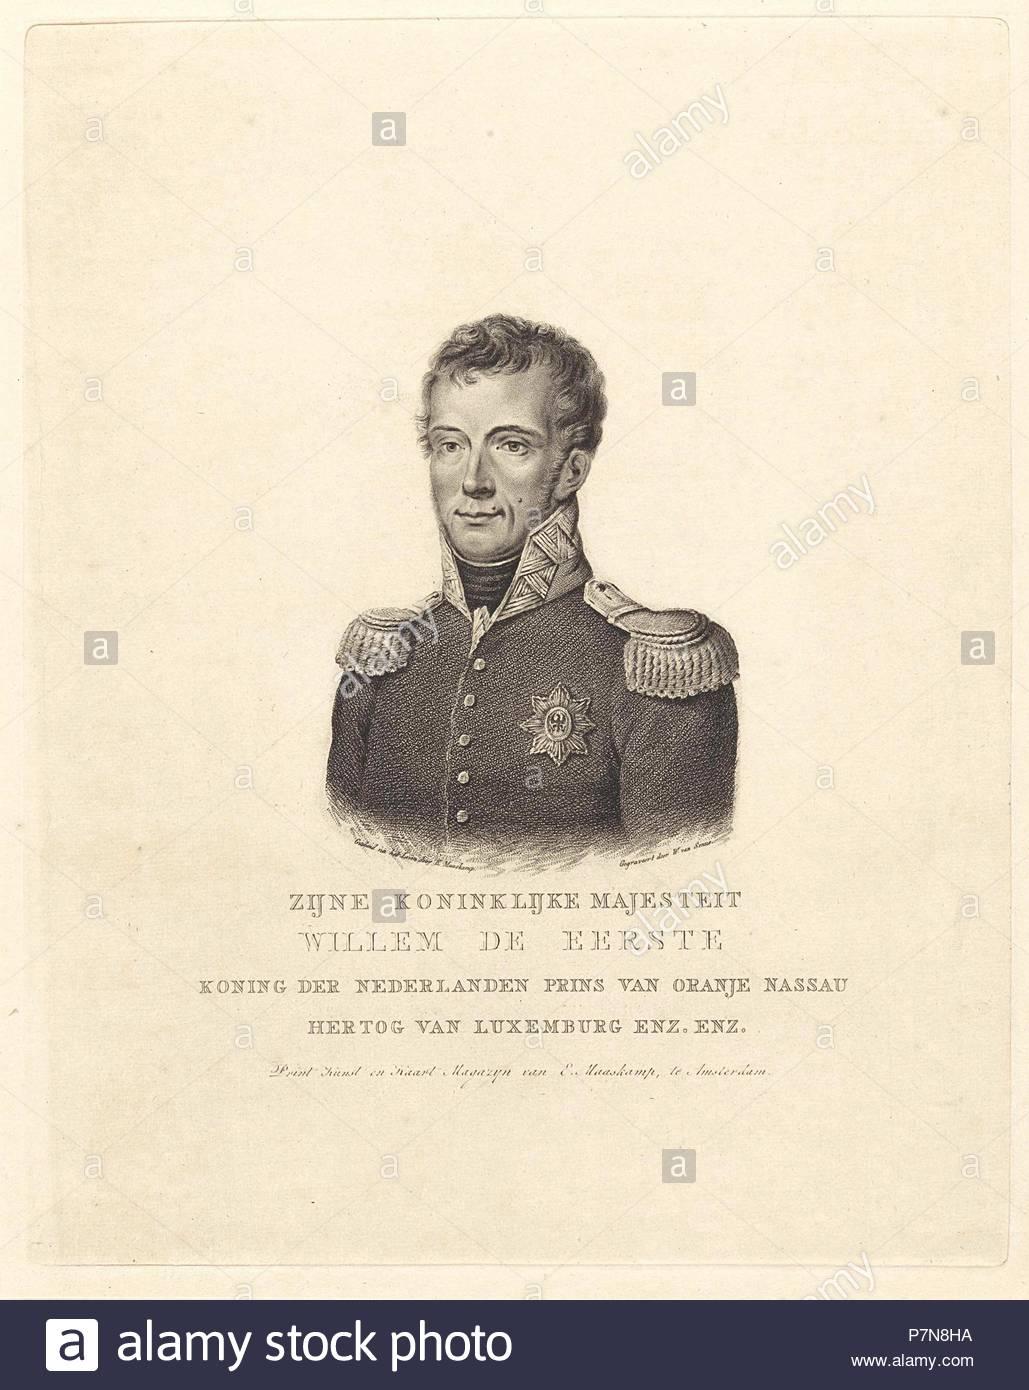 Retrato de Frederik Willem I, rey de los Países Bajos. Willem van Senus, Evert Maaskamp, 1814 - 1843. Imagen De Stock